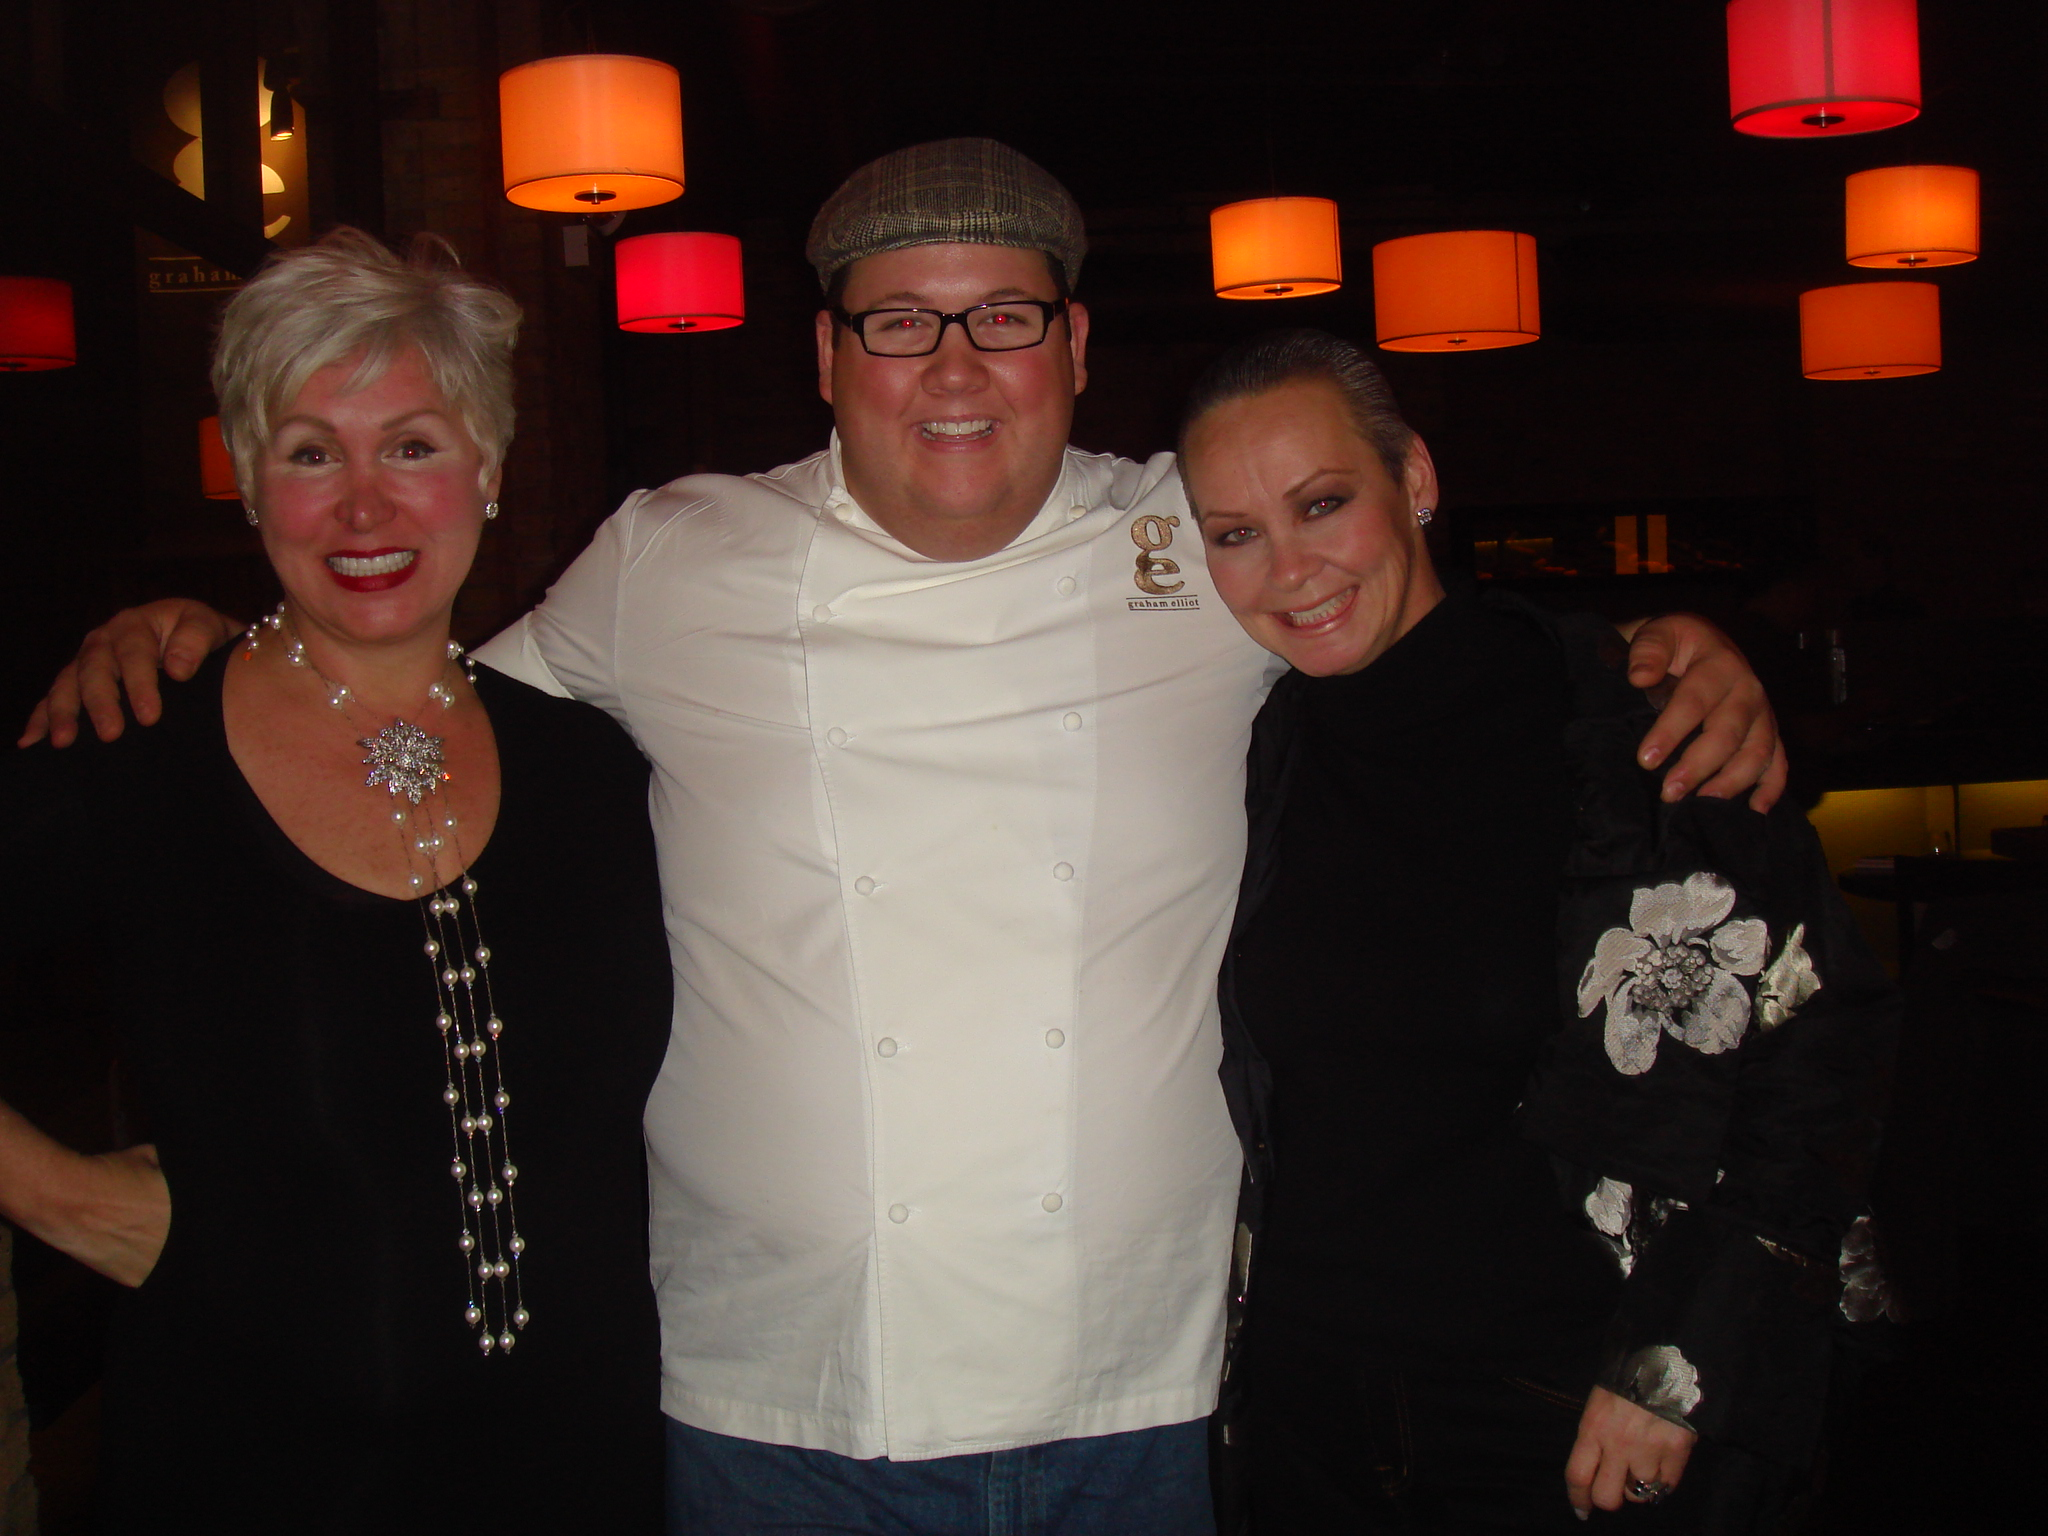 Rhonda, Chef Graham Elliot, and Me